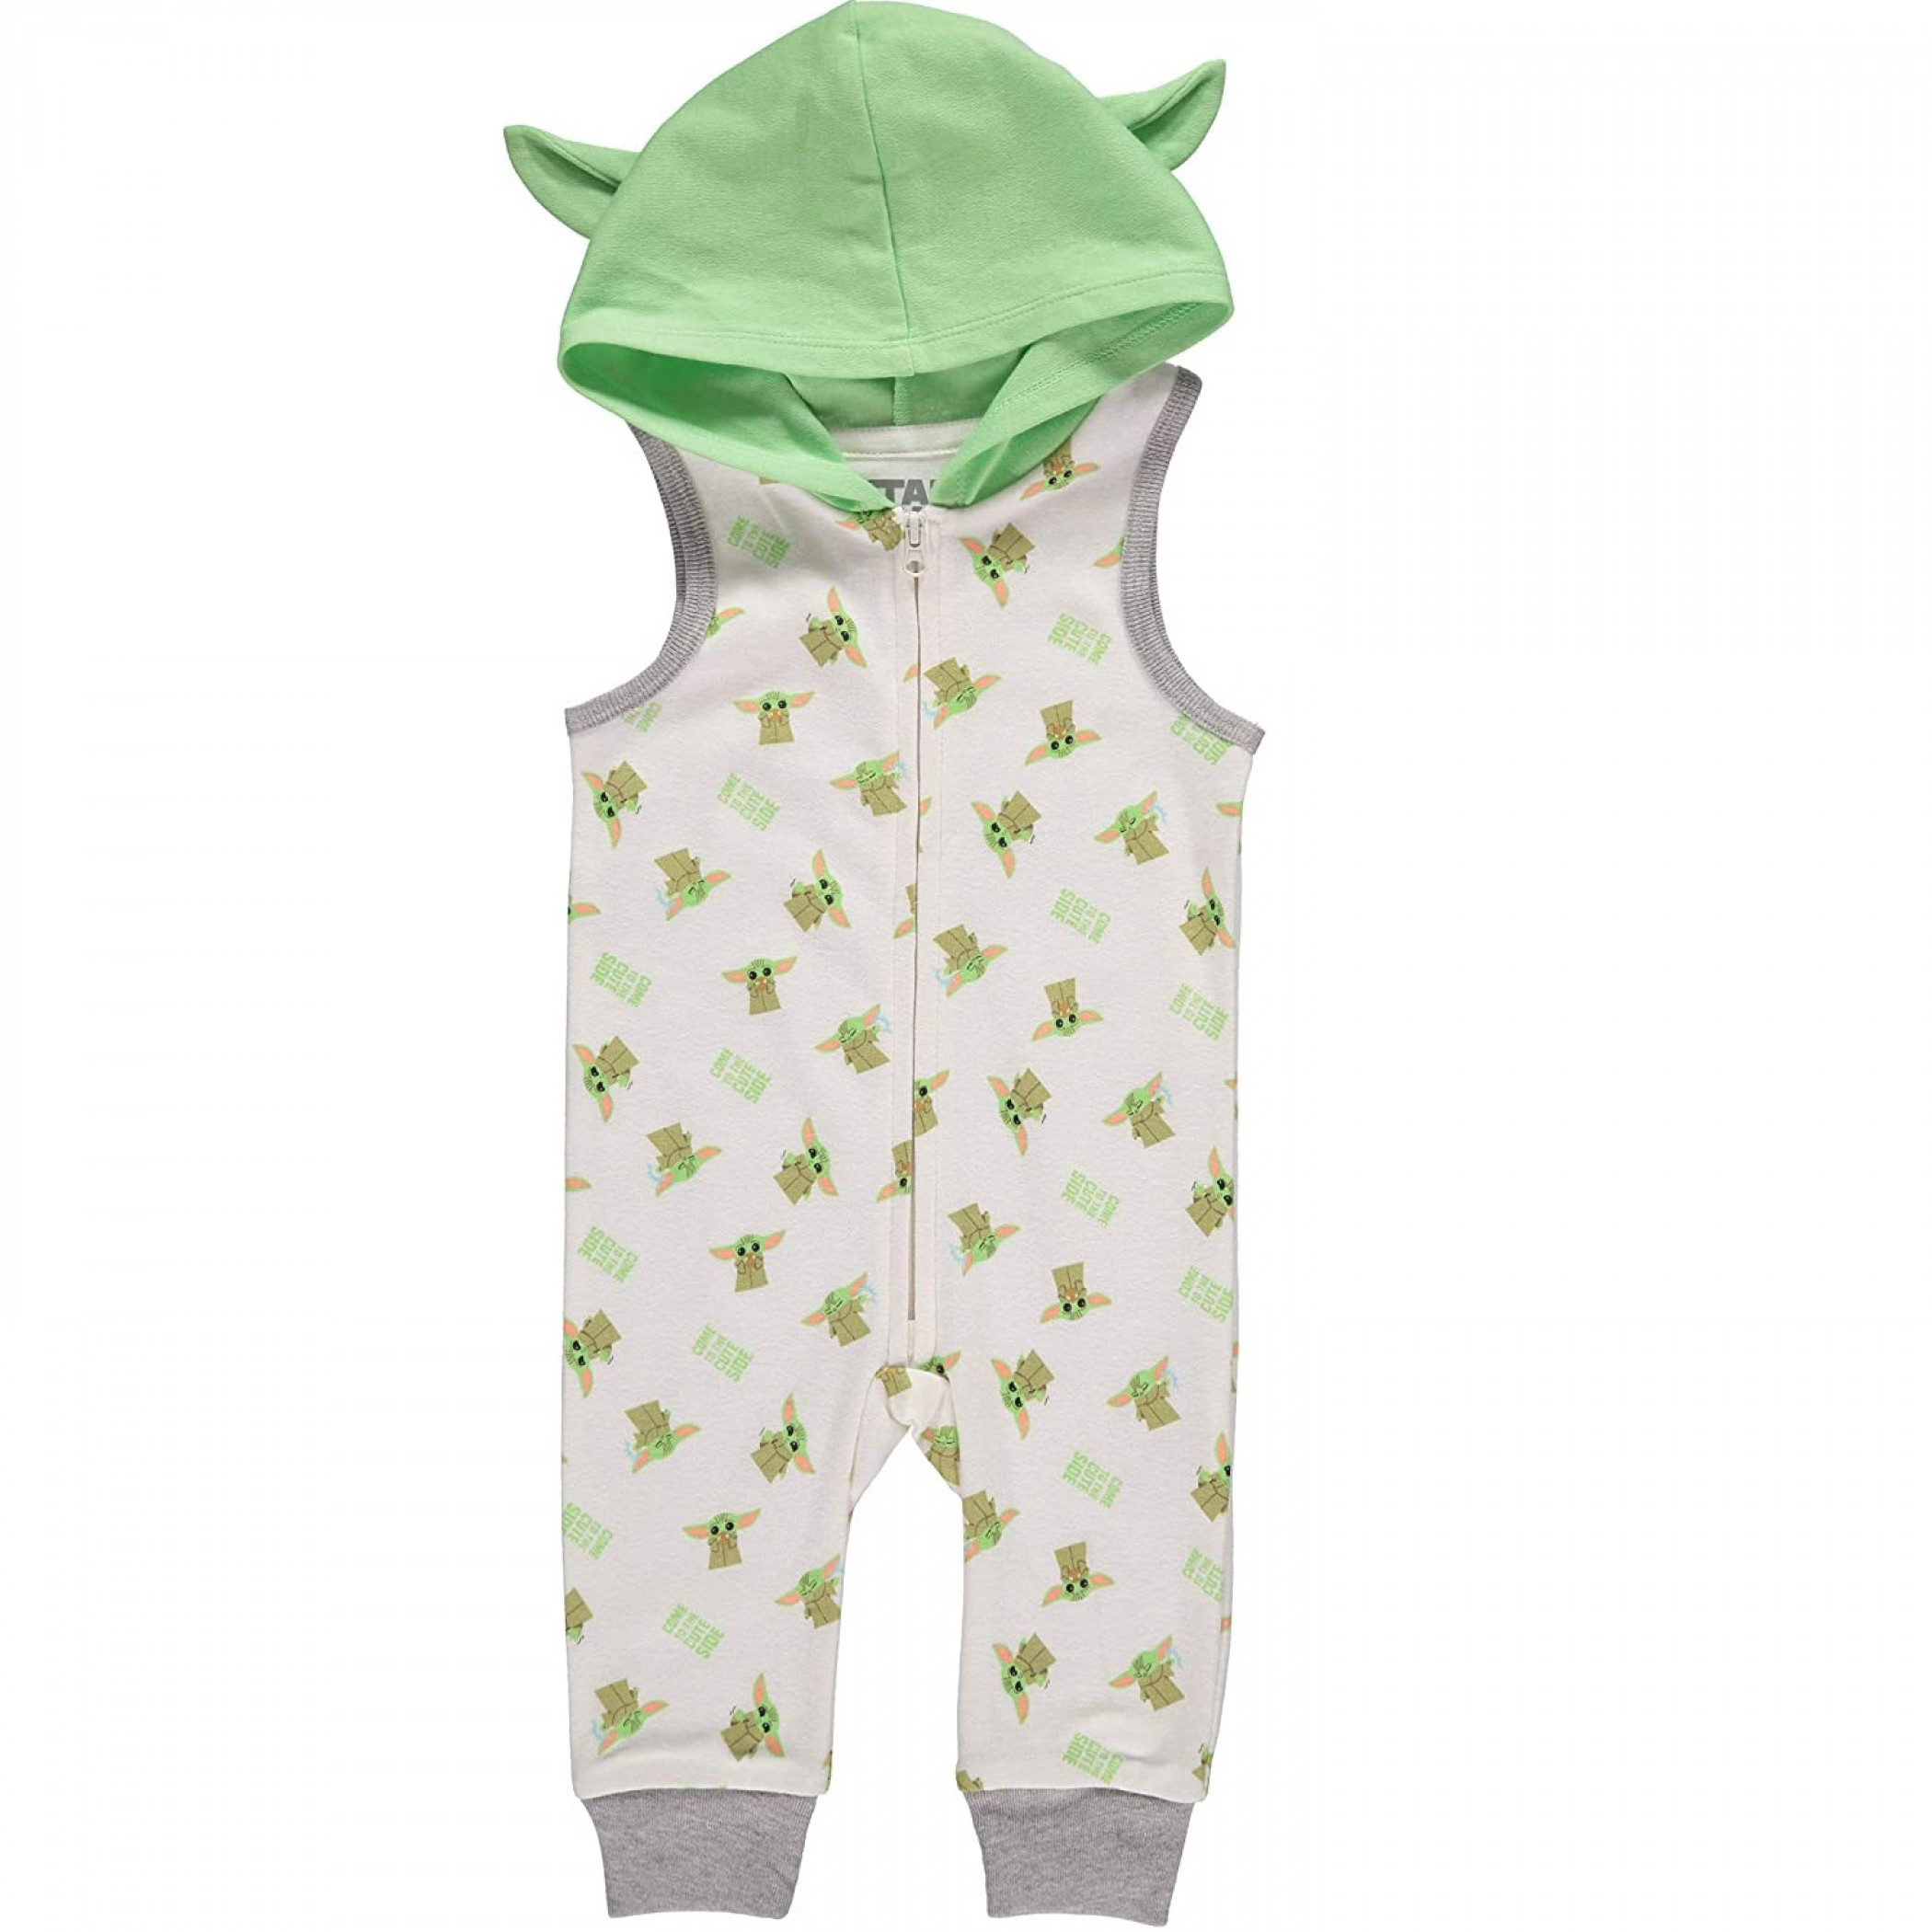 Star Wars The Mandalorian Child Sleeveless Romper With Hood